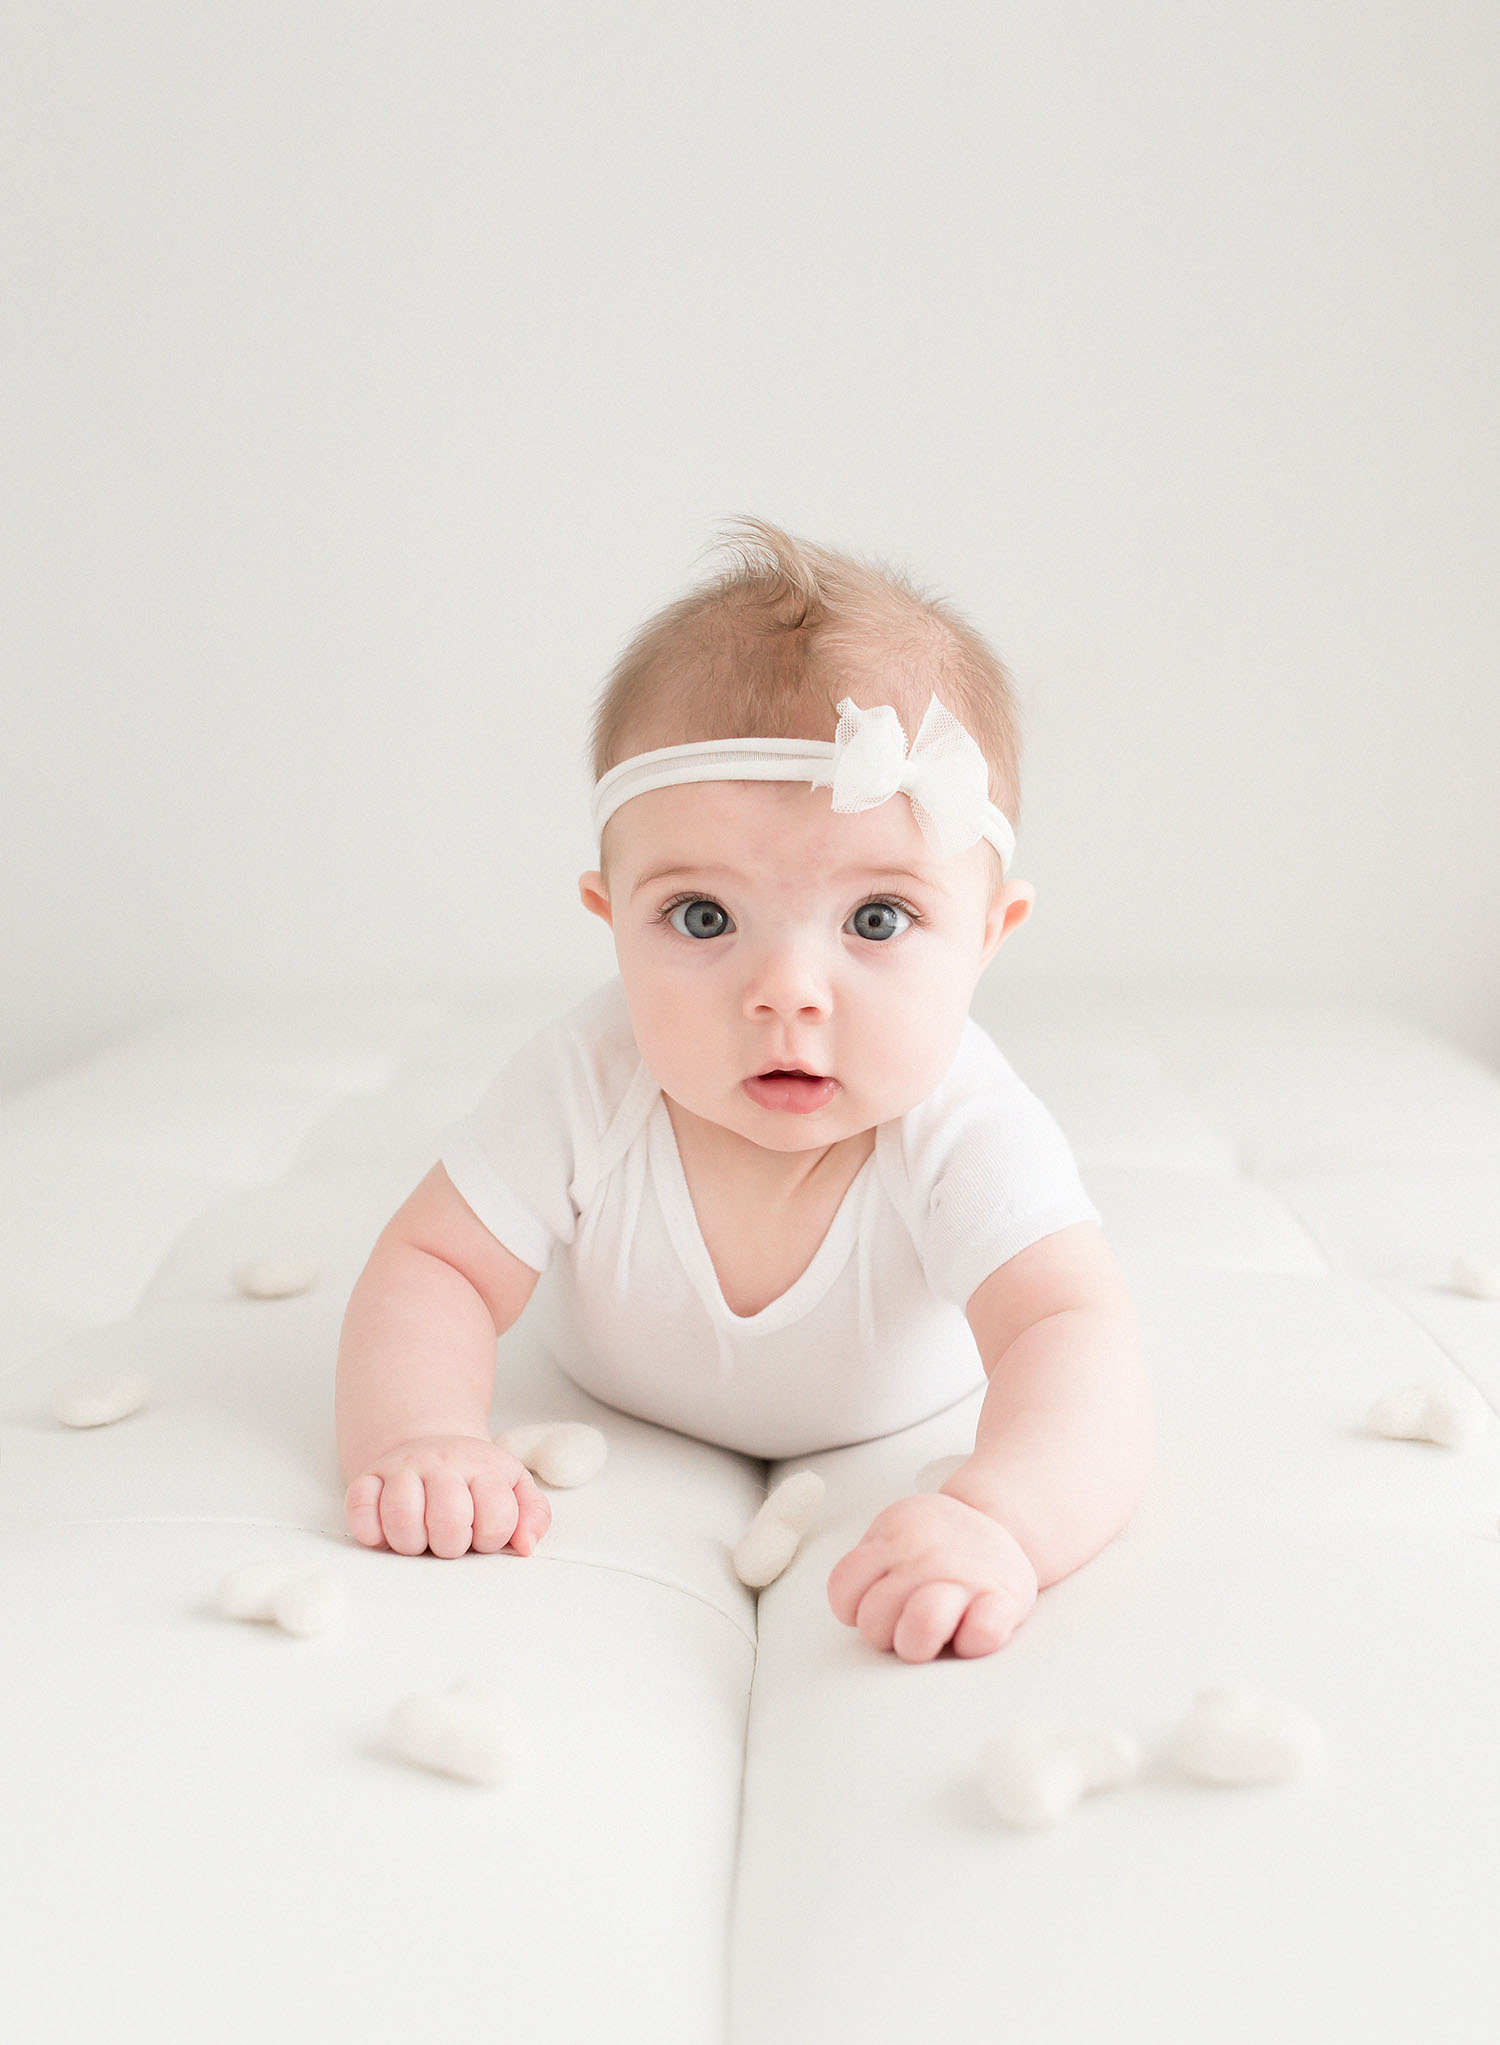 baby-photography-photographer-richmond-hill-pooler-ga.jpg